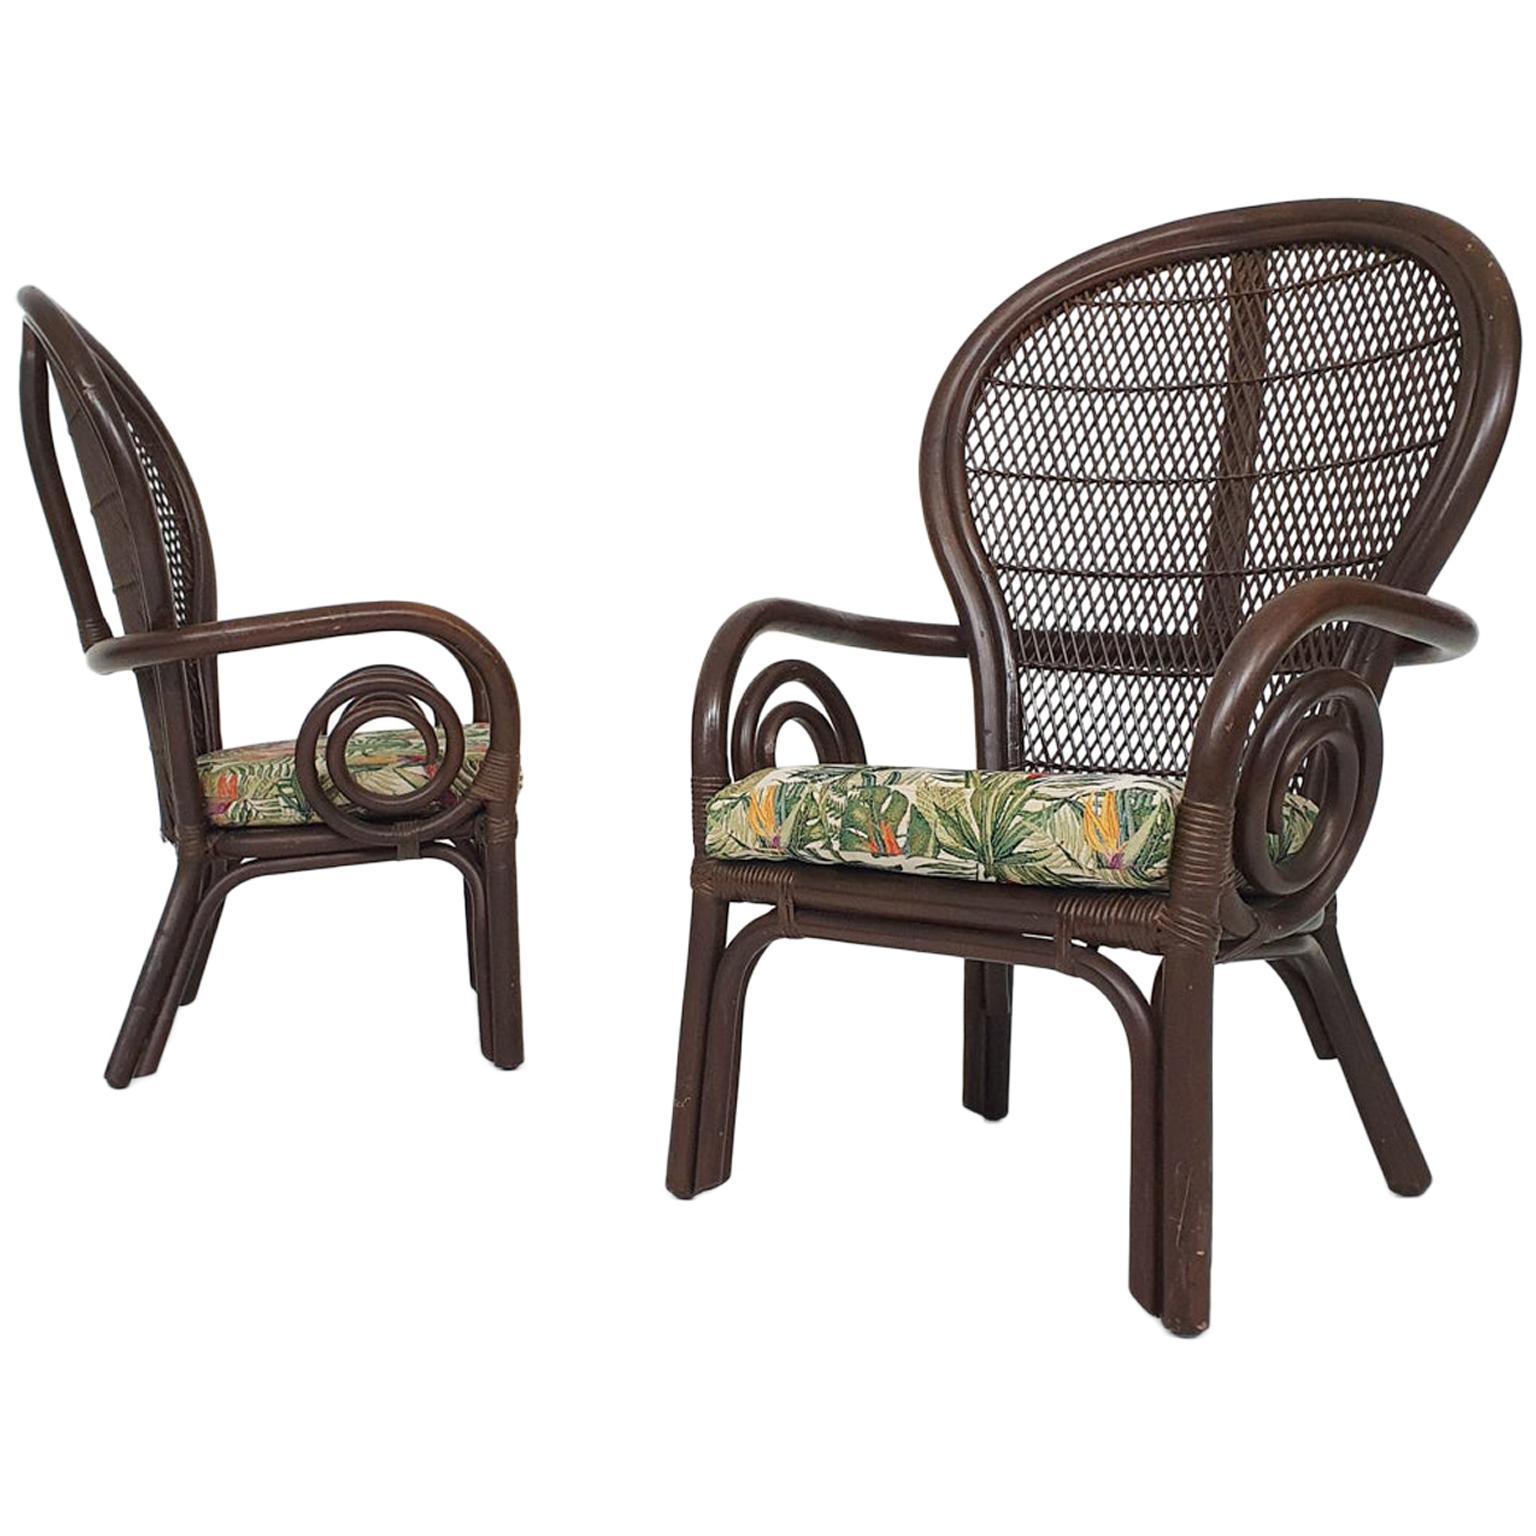 Set of 2 Midcentury Manou Lounge Chairs, 1970s